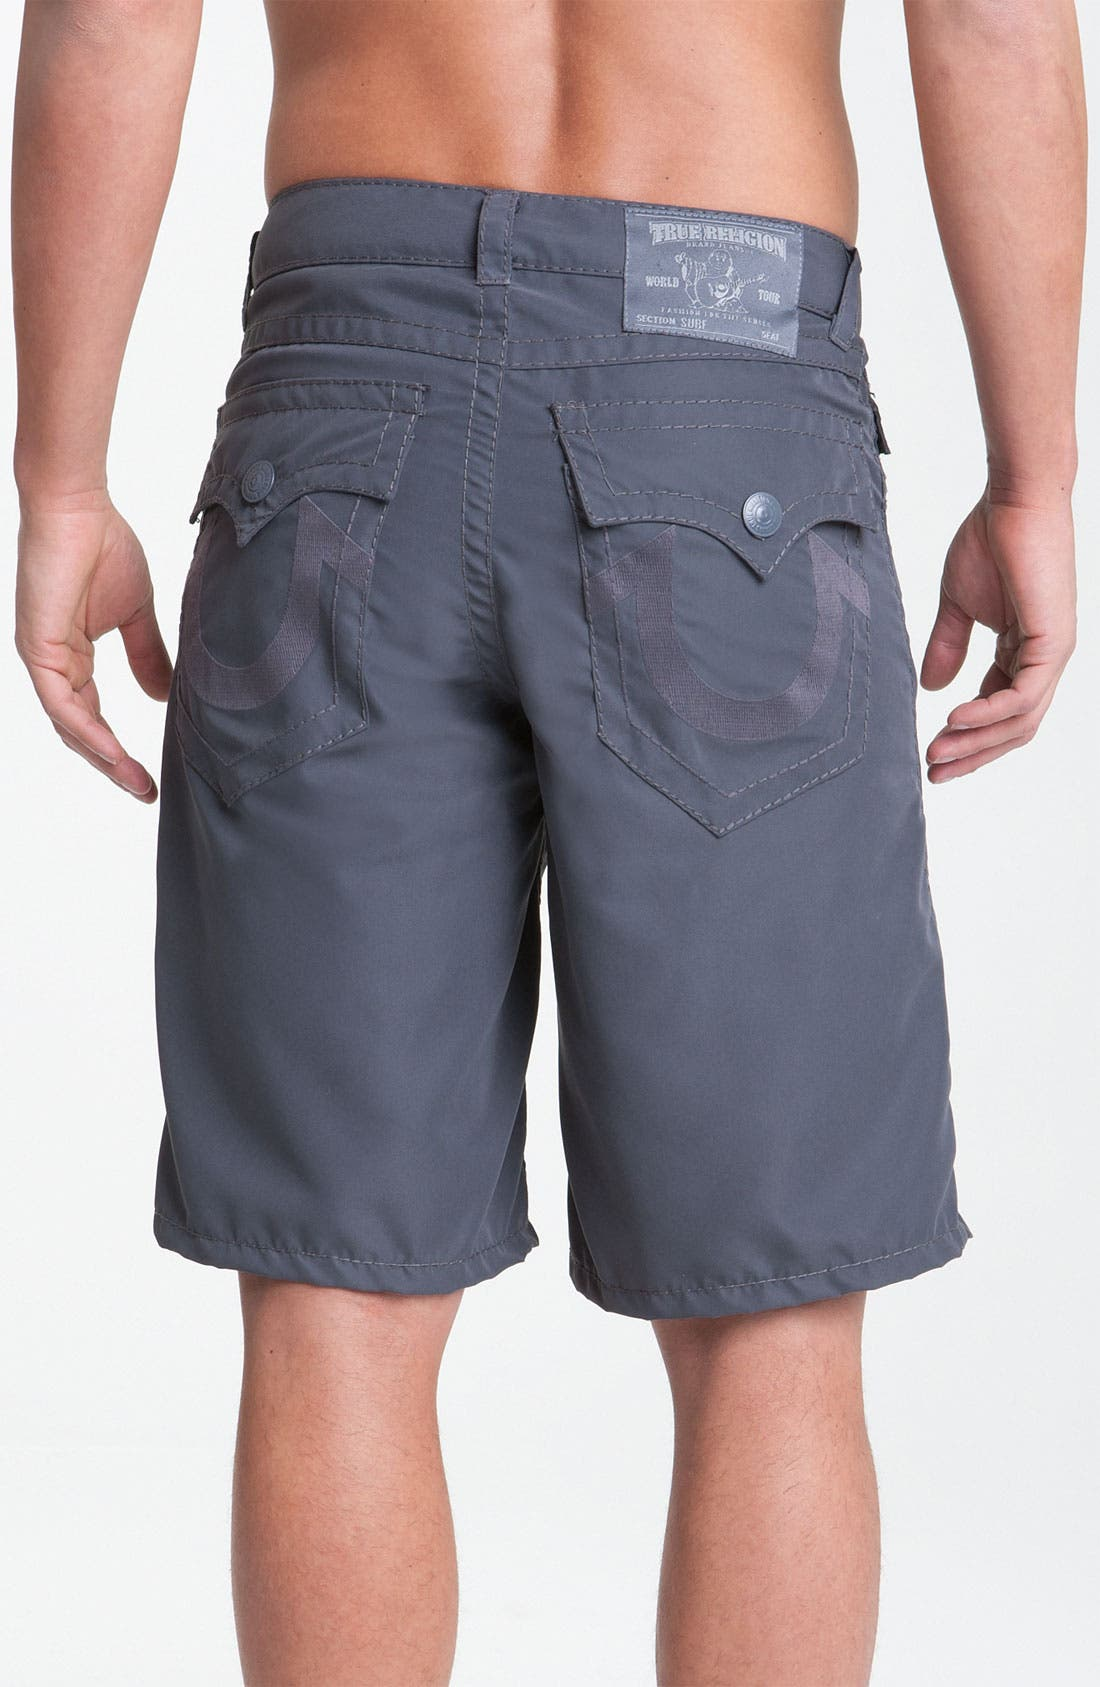 'PCH' Board Shorts,                         Main,                         color, Charcoal